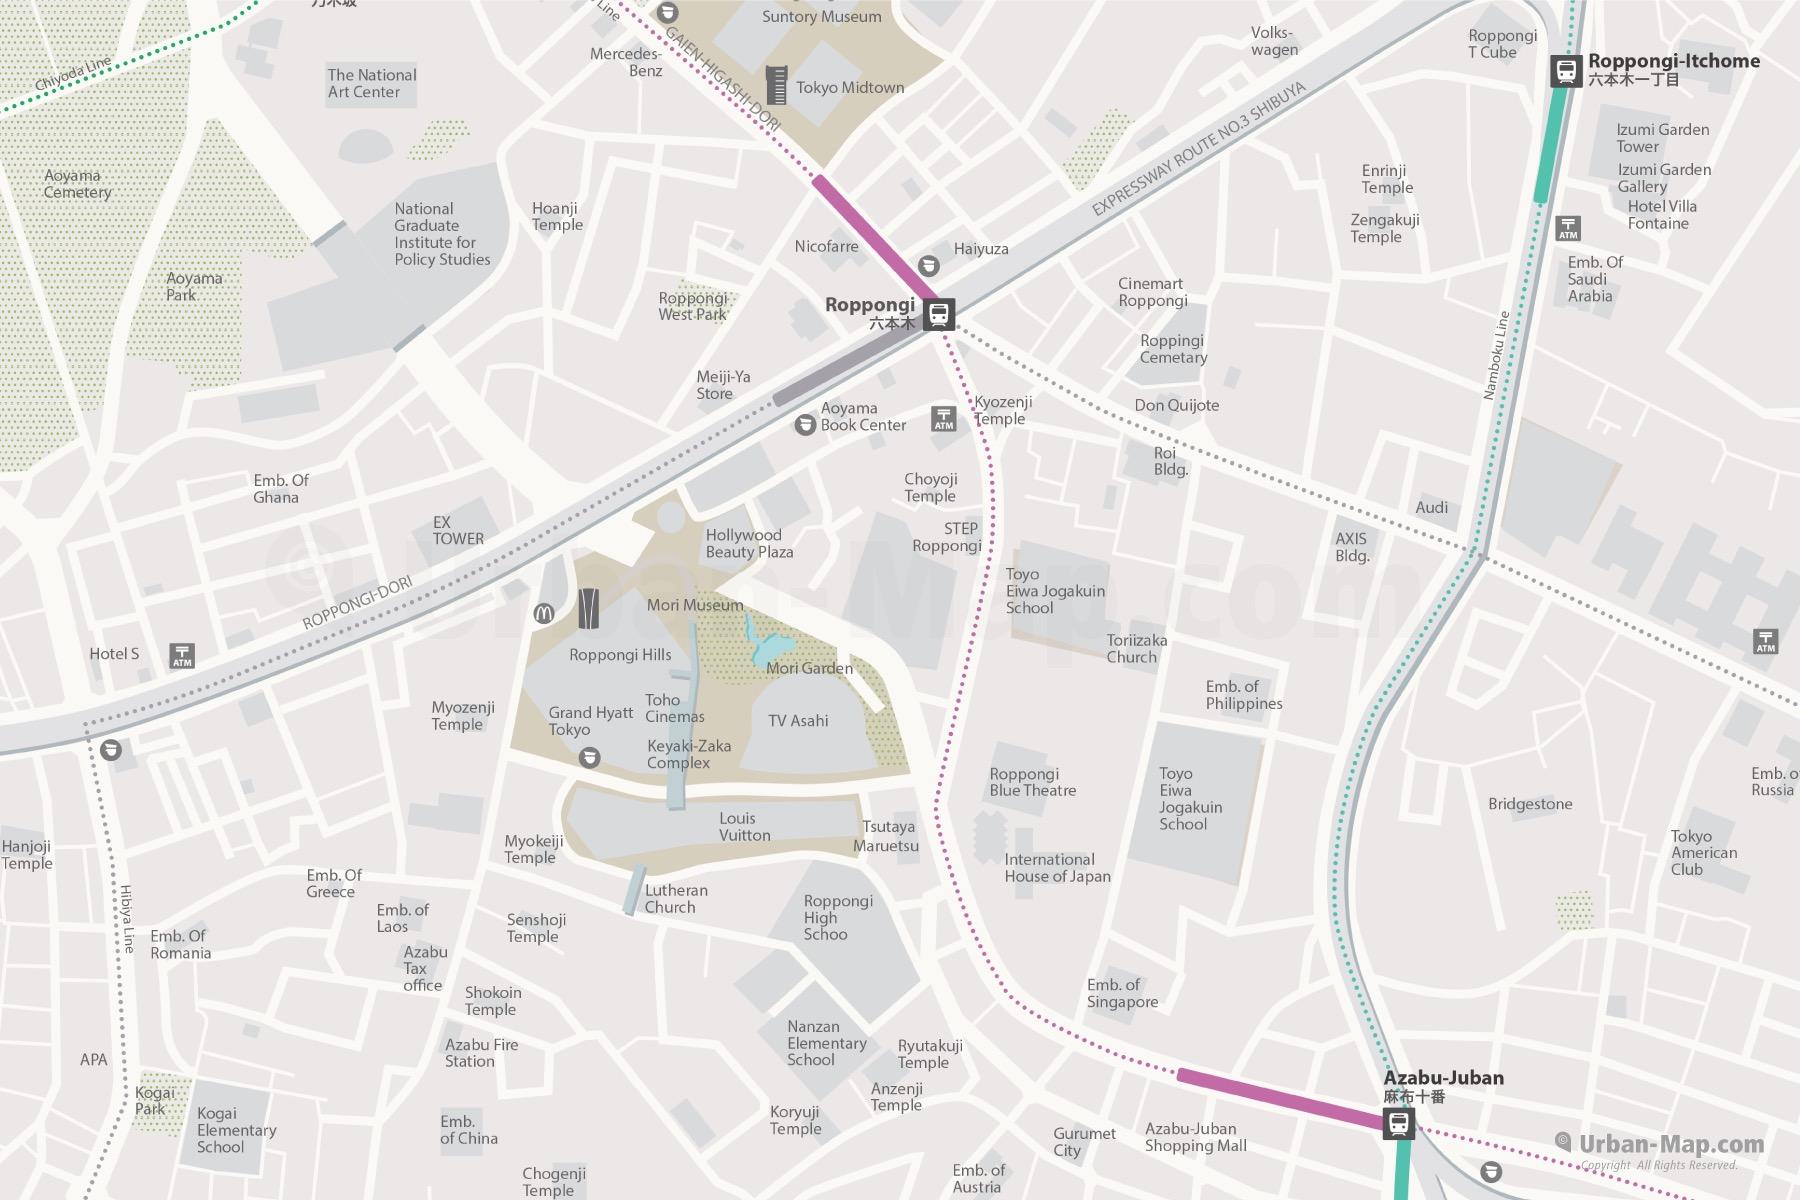 Tokyo Roppongi City Map, Roppongi Hills and Tokyo Midtown